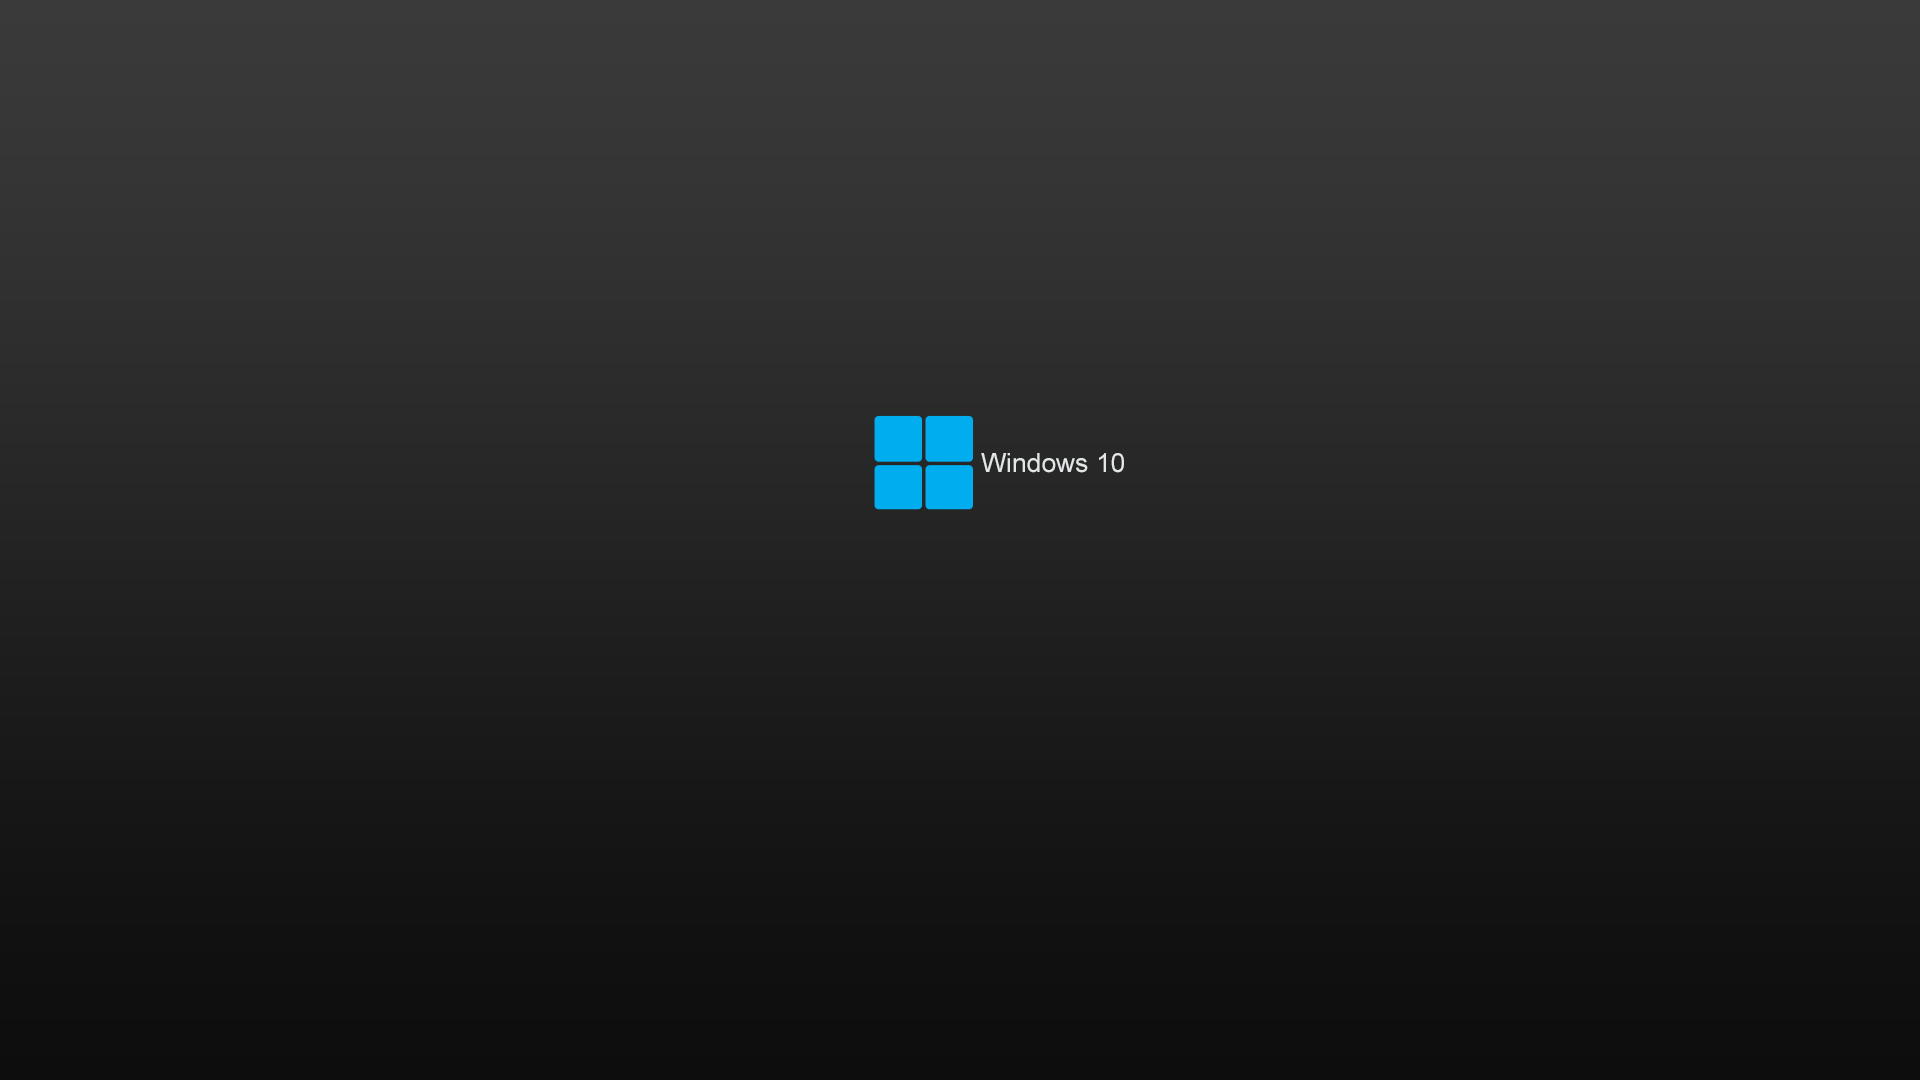 Windows 10 wallpaper -  Windows 10 Wallpaper